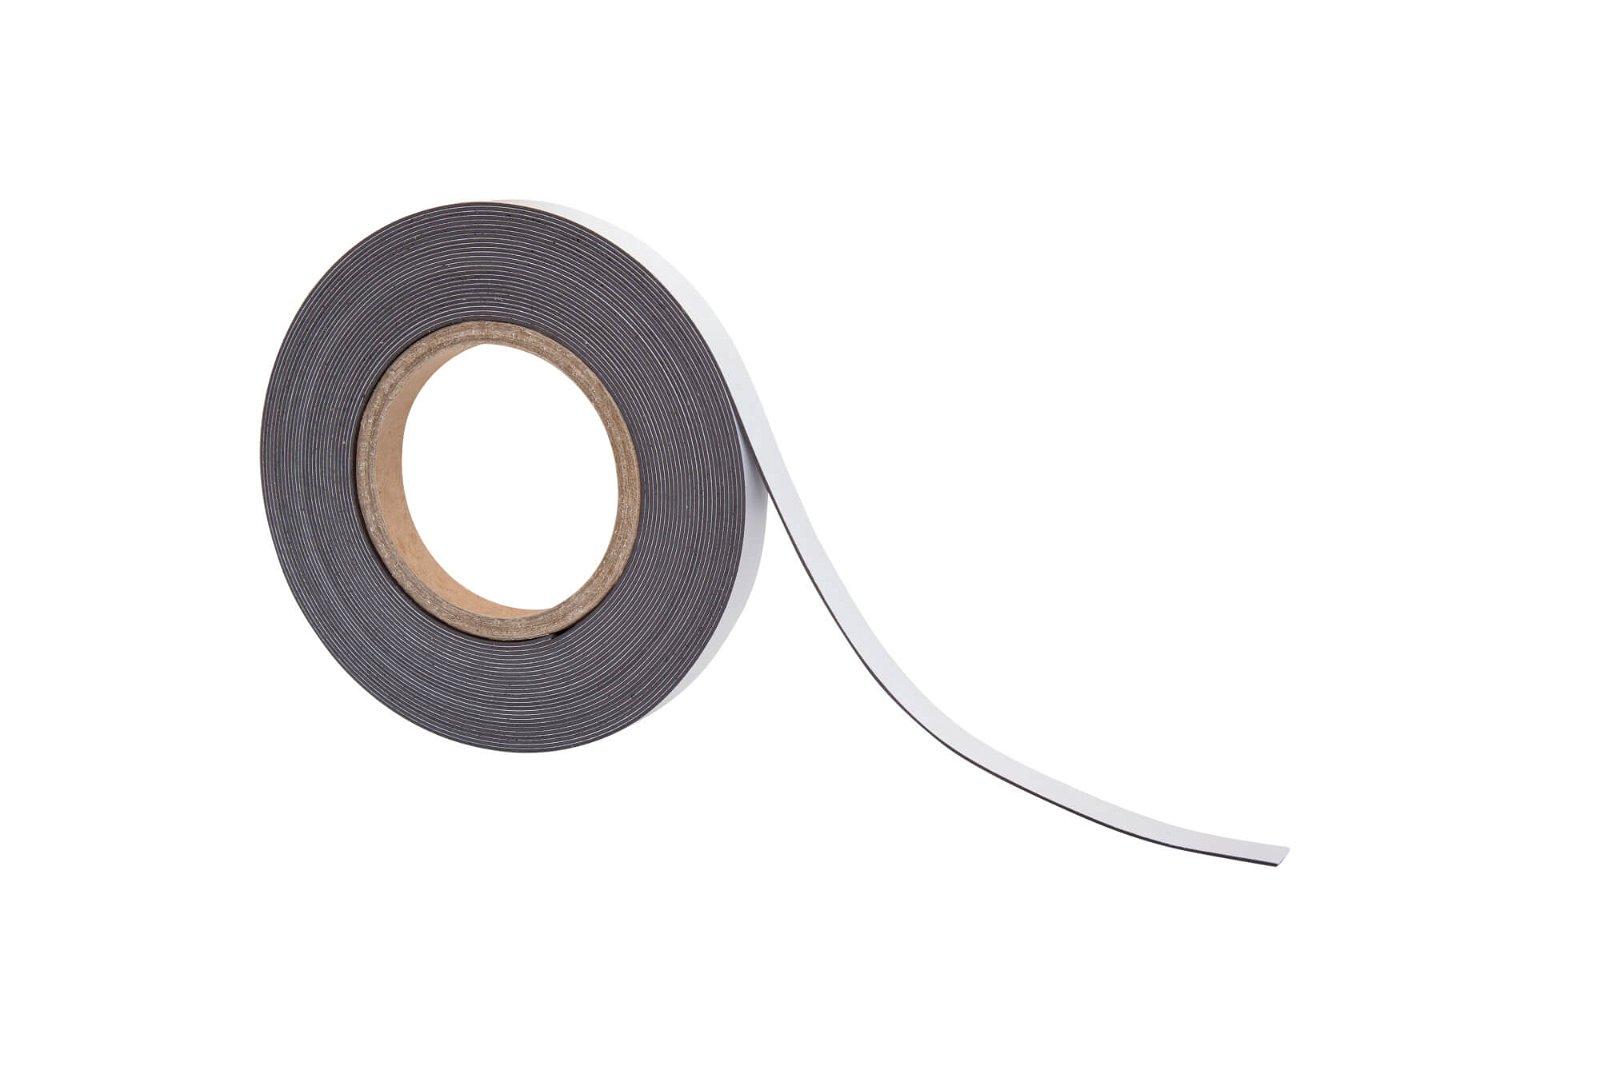 Magnetband selbstklebend, 10 m x 15 mm x 1 mm, sonstige